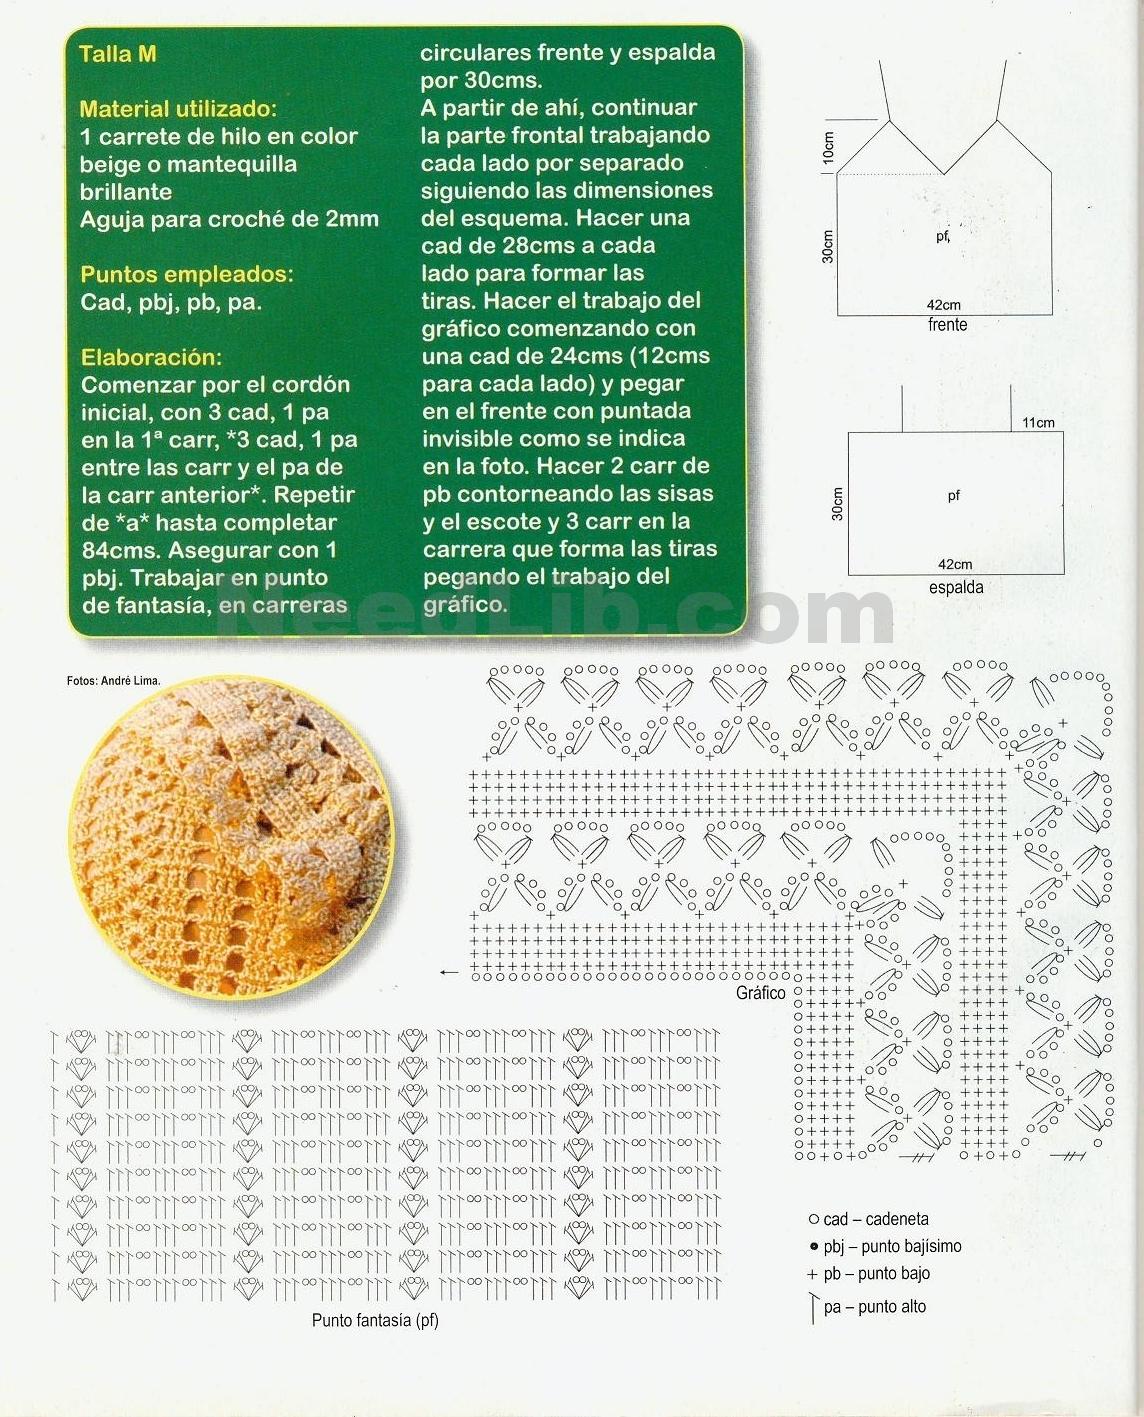 2004_Ganchillo y crochet ano 3 nro 22 (43)